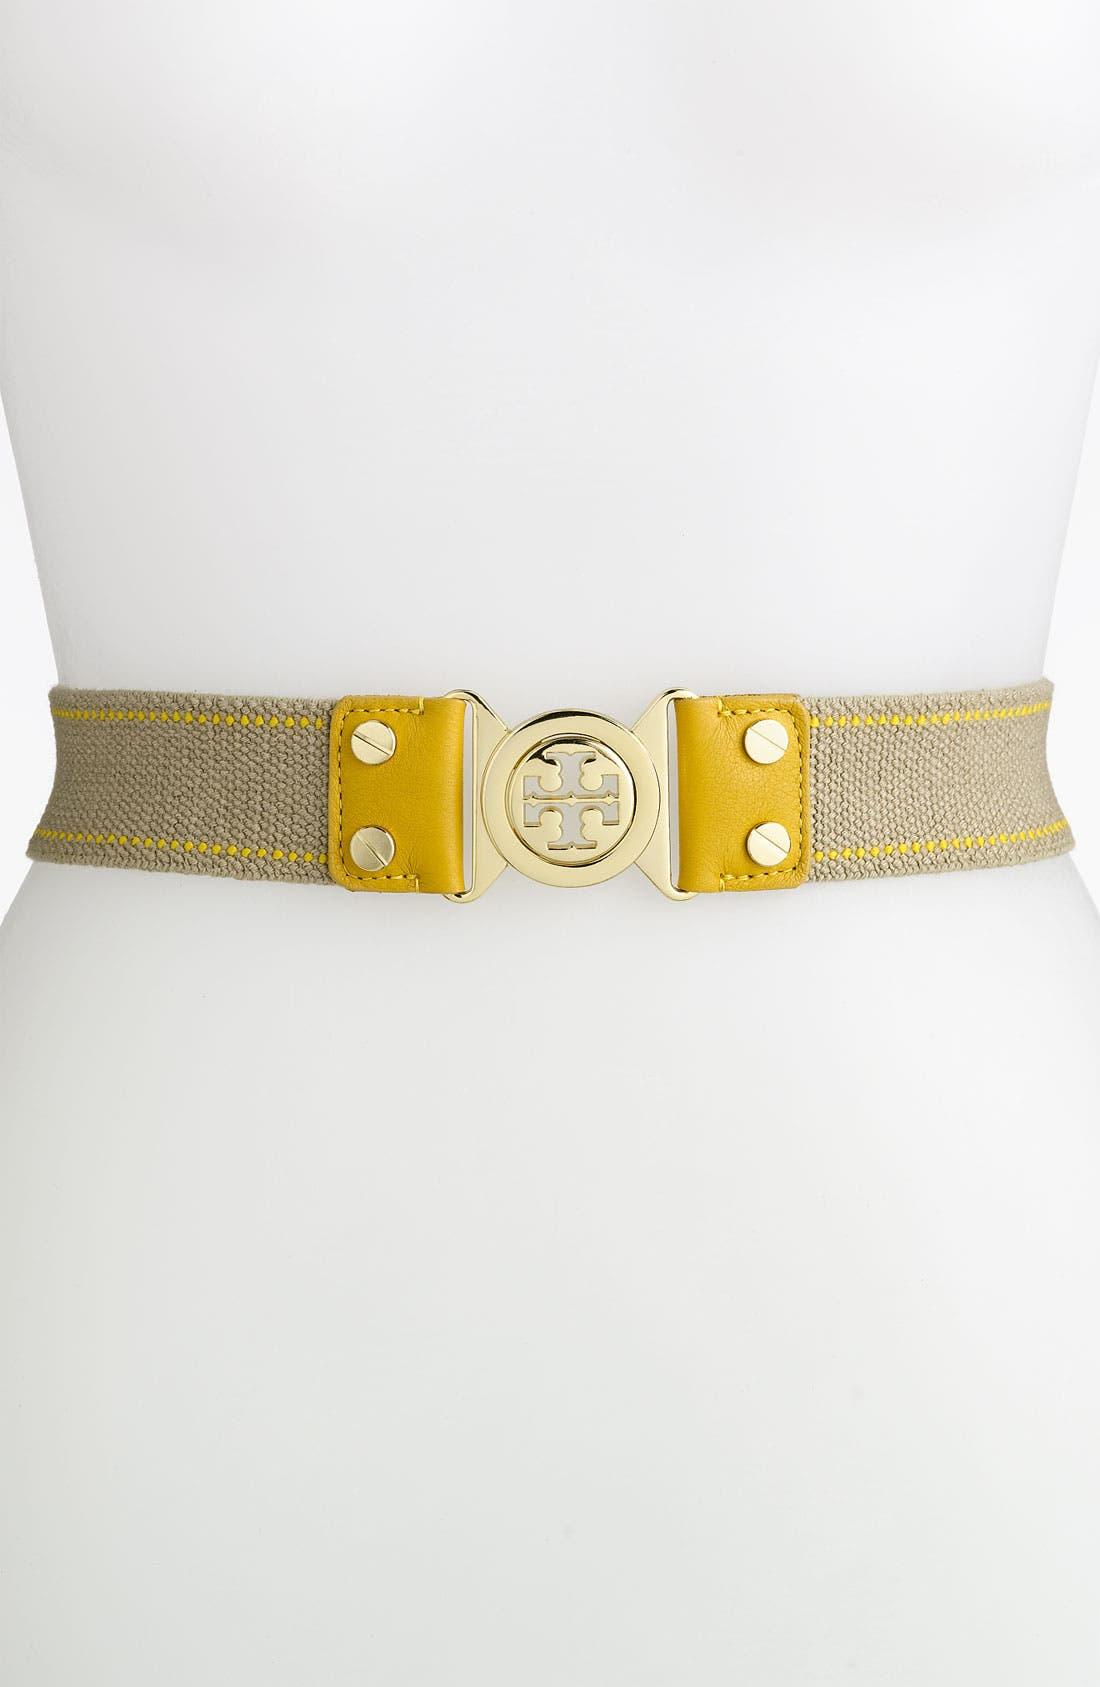 Main Image - Tory Burch 'Stretch Interlocking' Belt